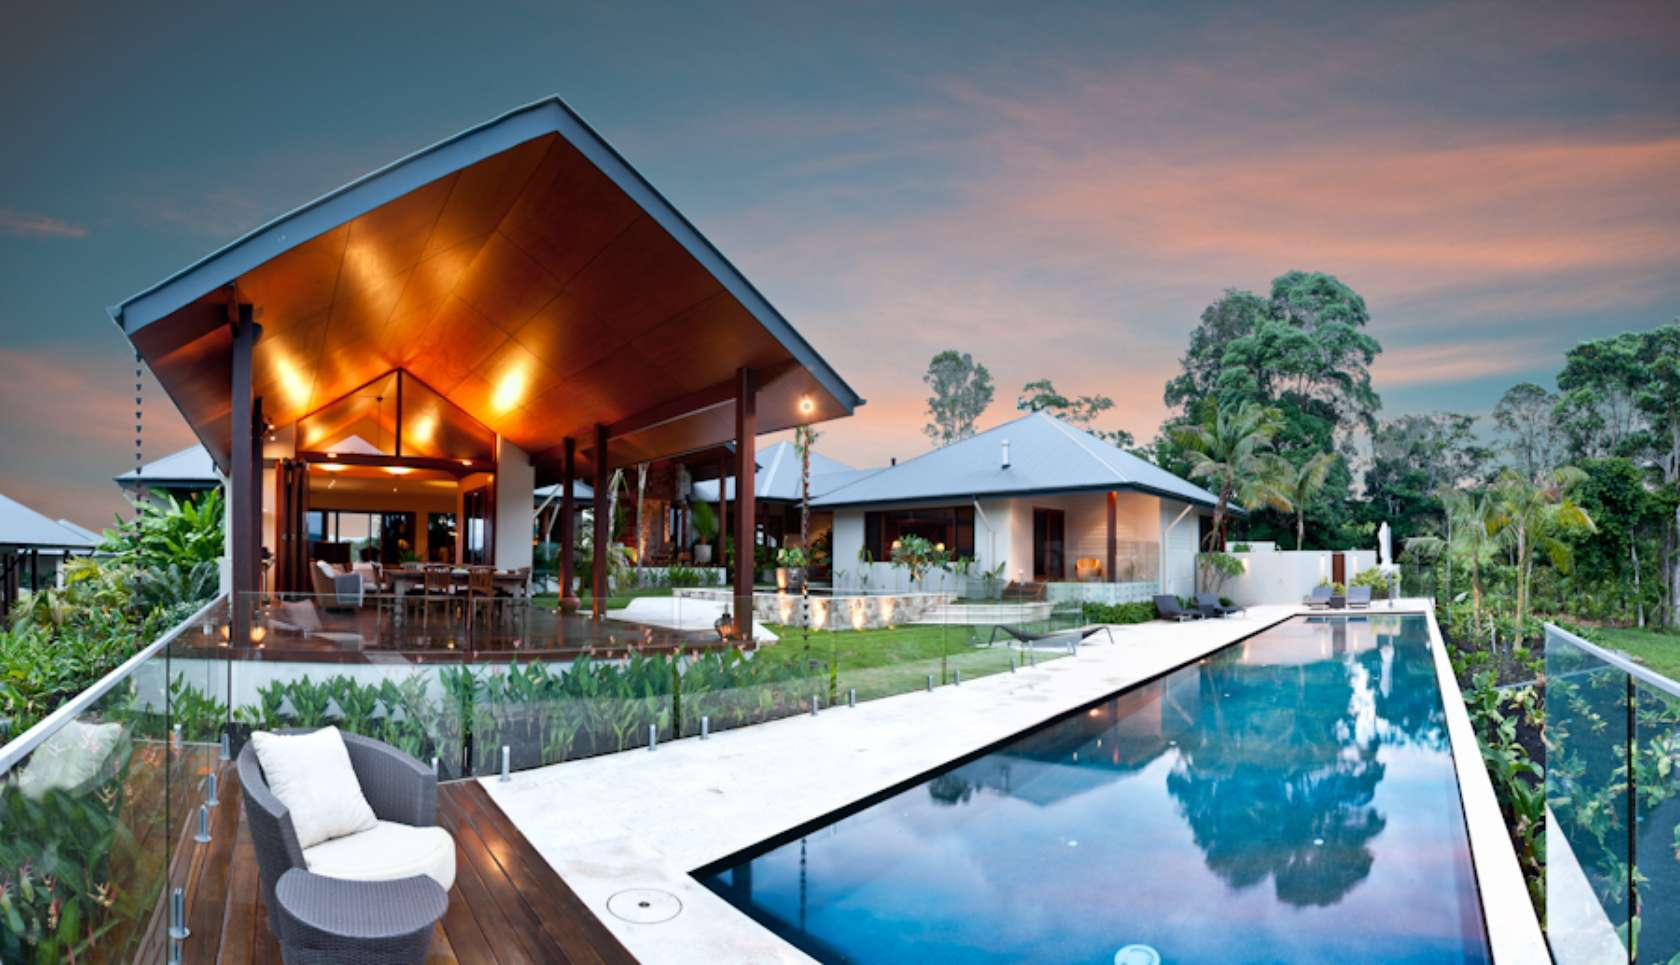 Bali Meets The Australian Farm House Architizer